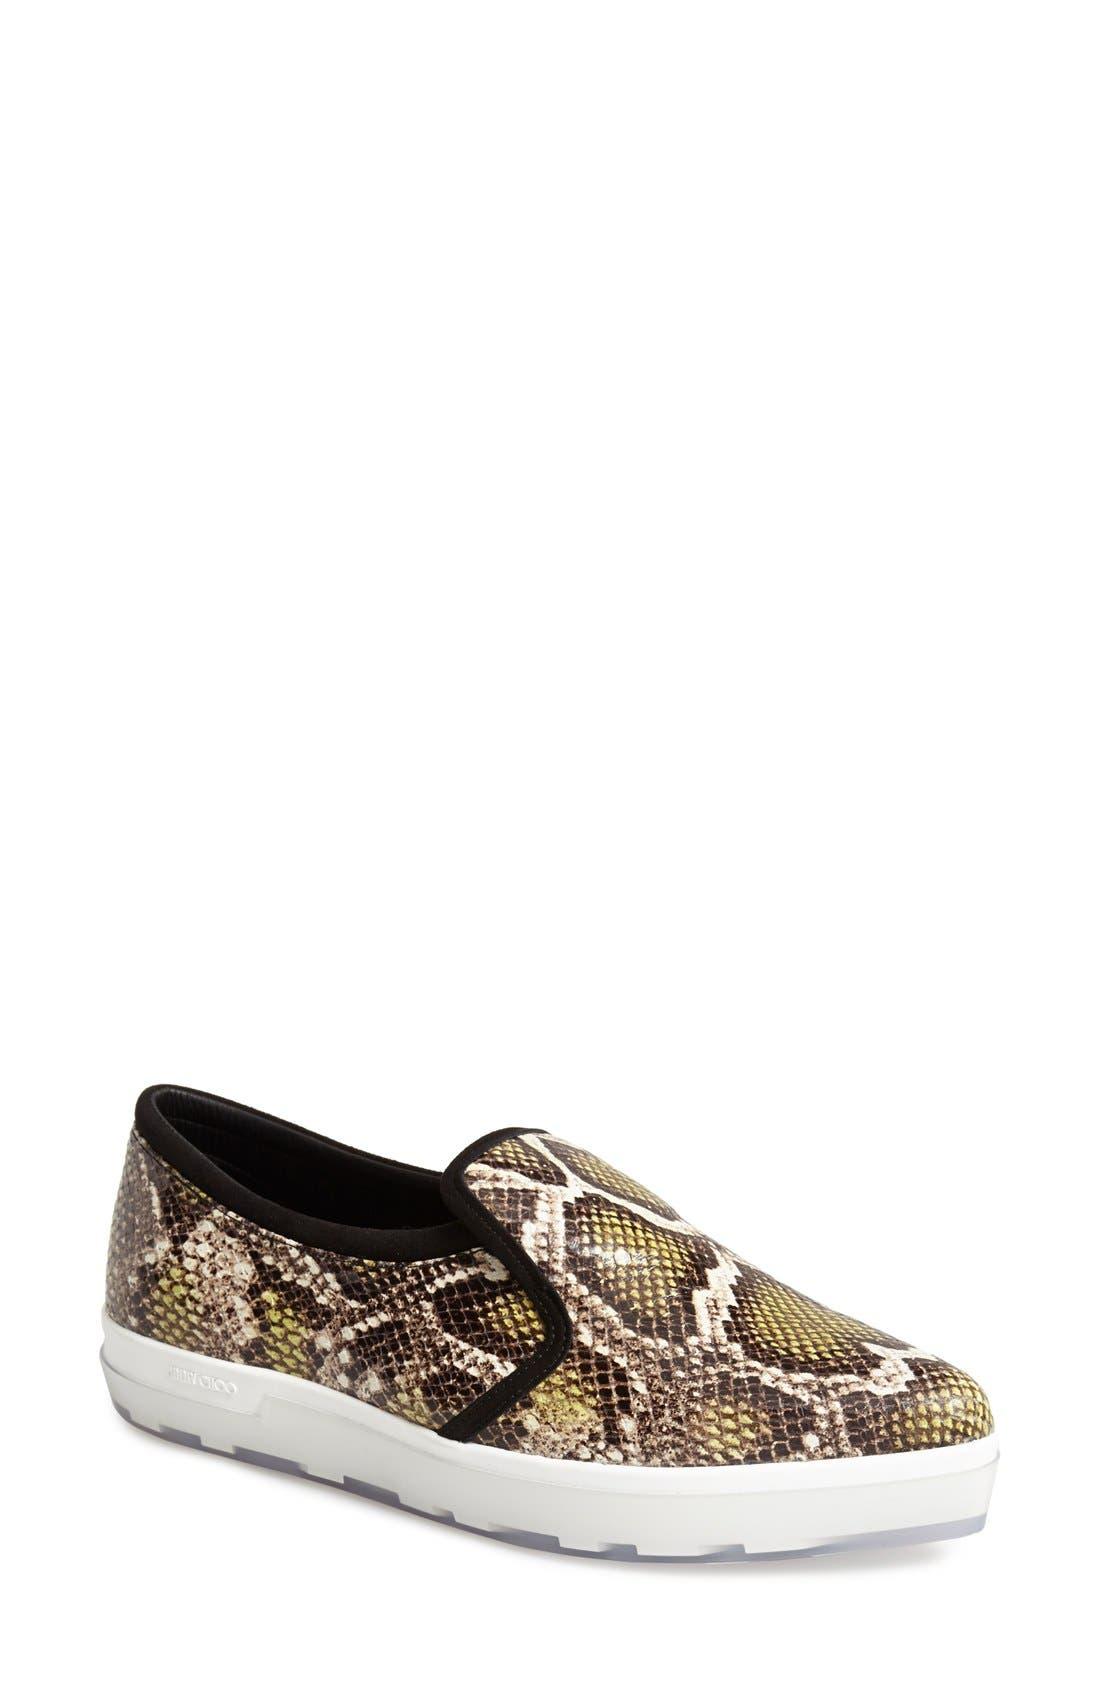 Alternate Image 1 Selected - Jimmy Choo 'Brooklyn' Slip-On Sneaker (Women)